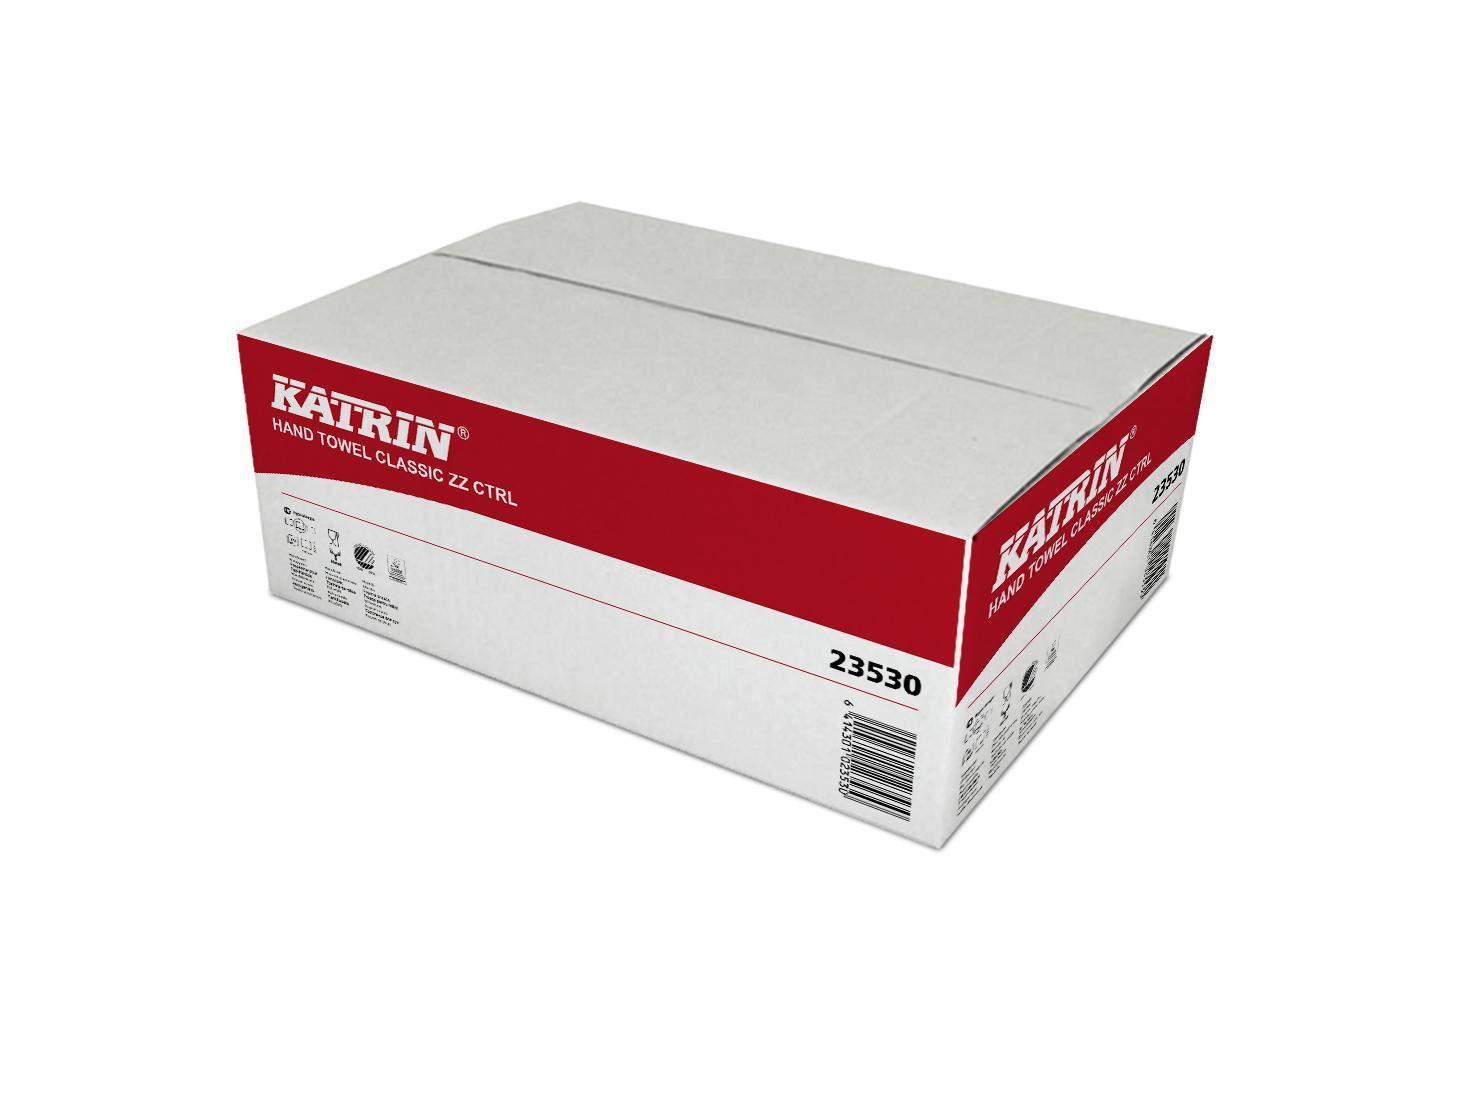 Ručníky Z-Z 240ks 2vr. 23530 bílé KatrinClassic